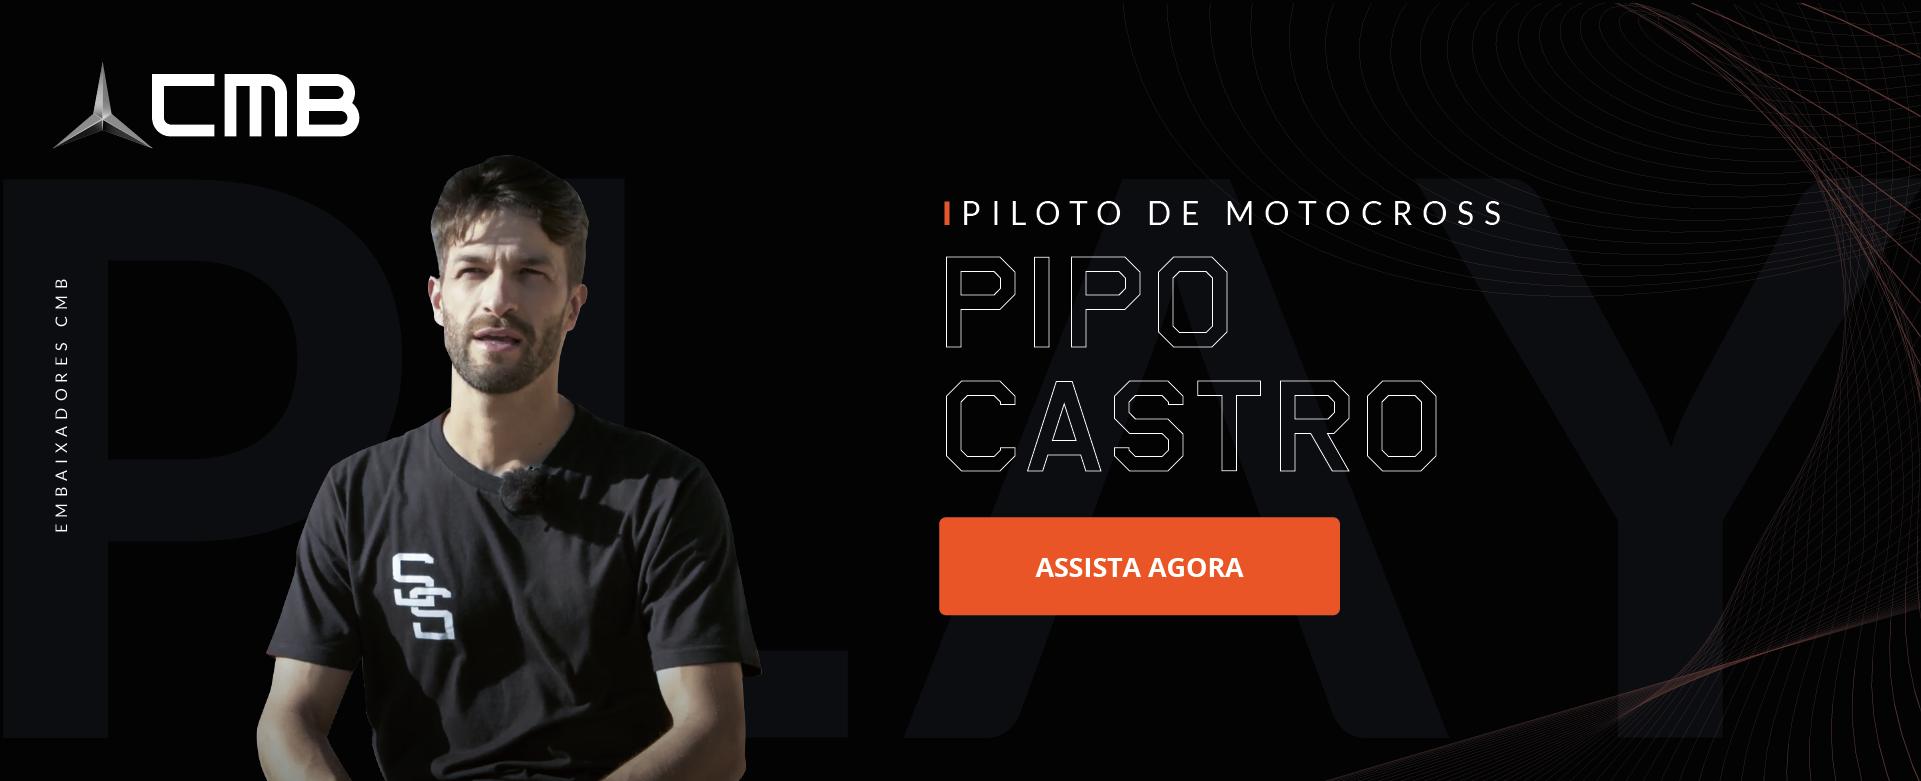 Lp CMB - Midia Social - PIPO CASTRO _Banner Site - Deskttop